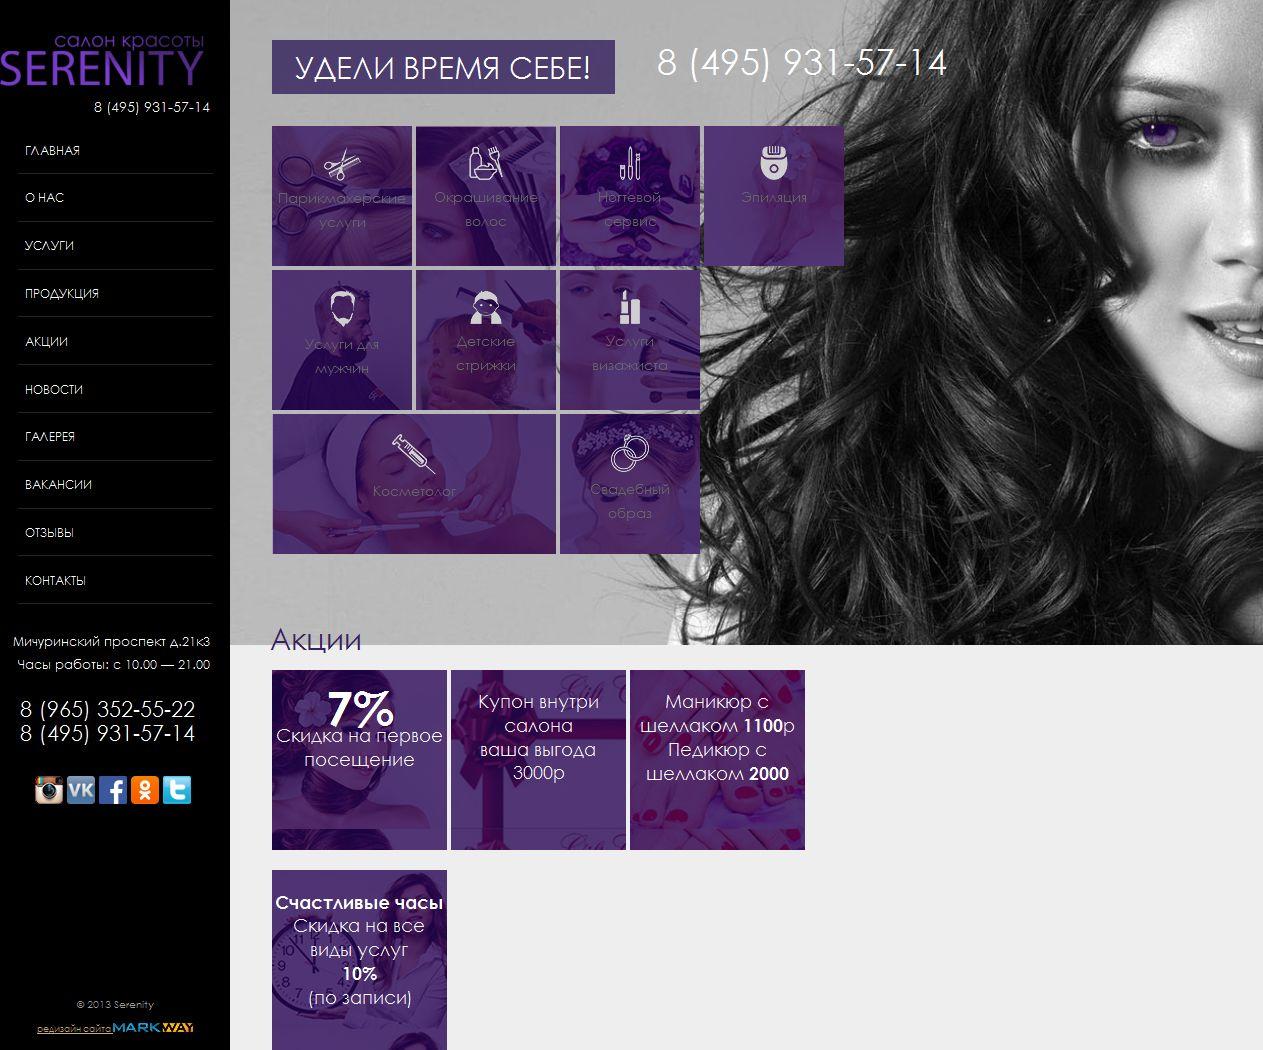 Serenity-salon.ru - салон красоты Серенити в Москве